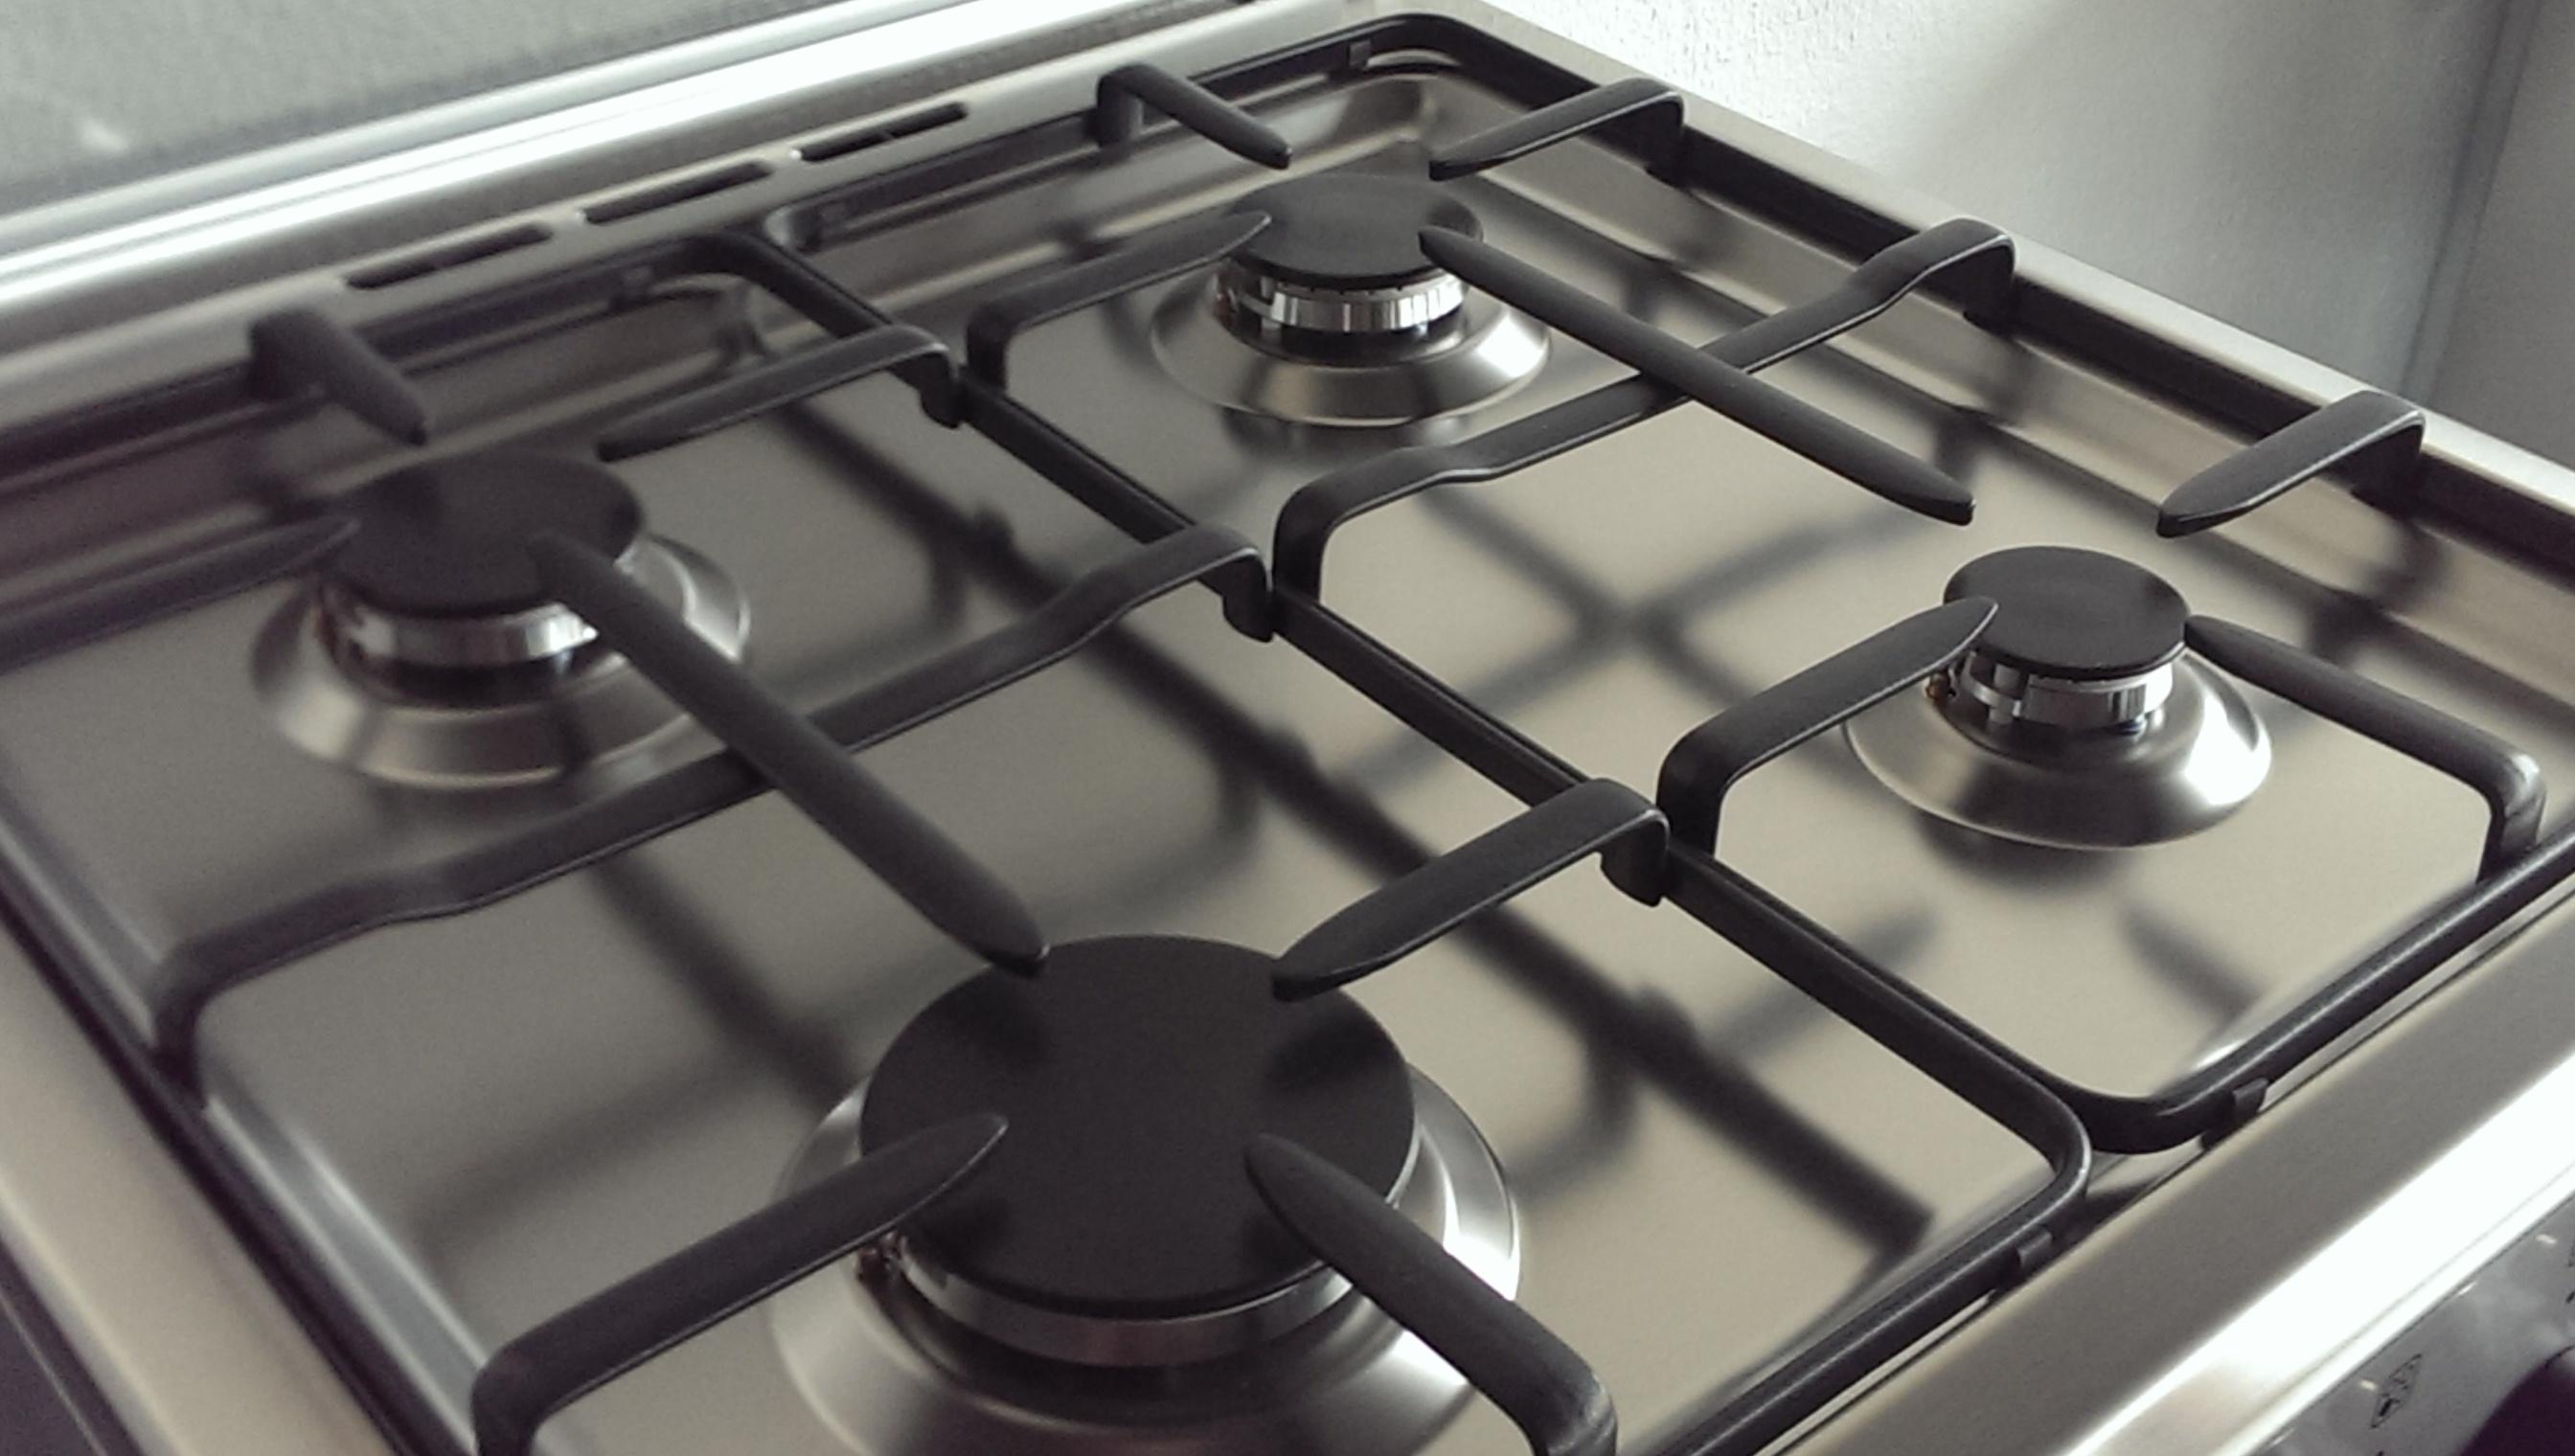 lagermania tu64071cx gasherd mit gas umluft backofen. Black Bedroom Furniture Sets. Home Design Ideas